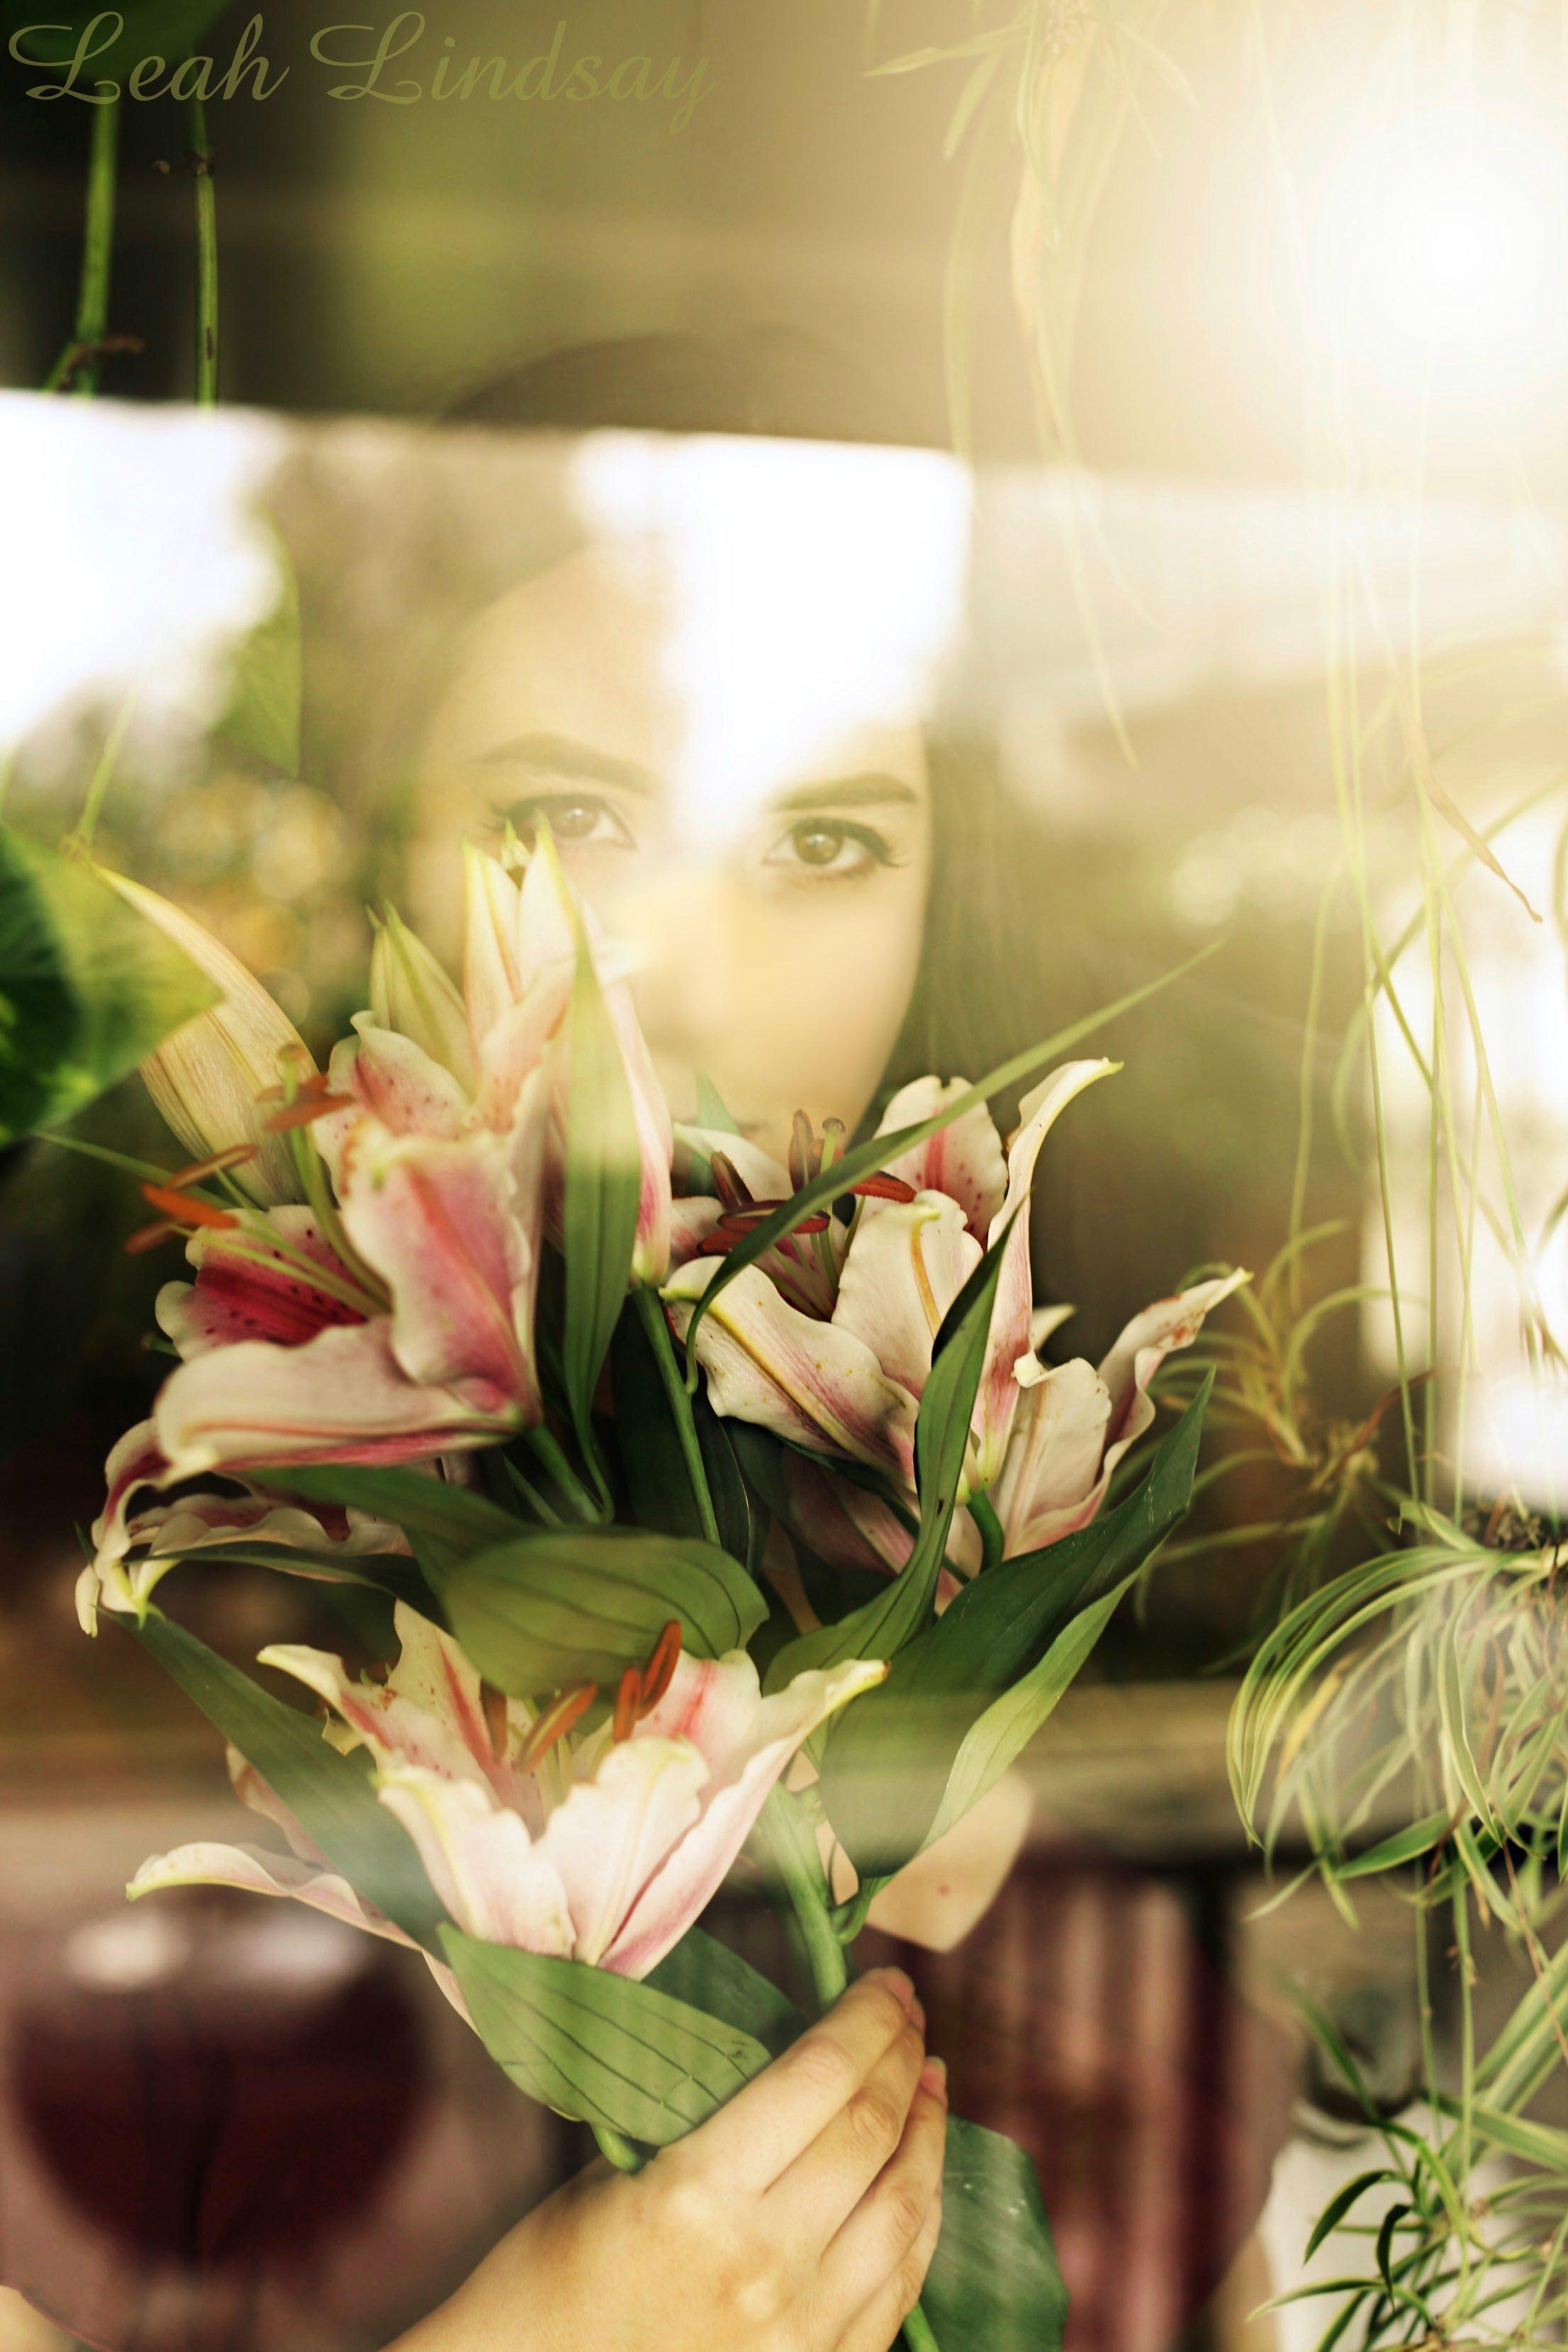 Leah Lindsay - All Natural Romantic Courtesan